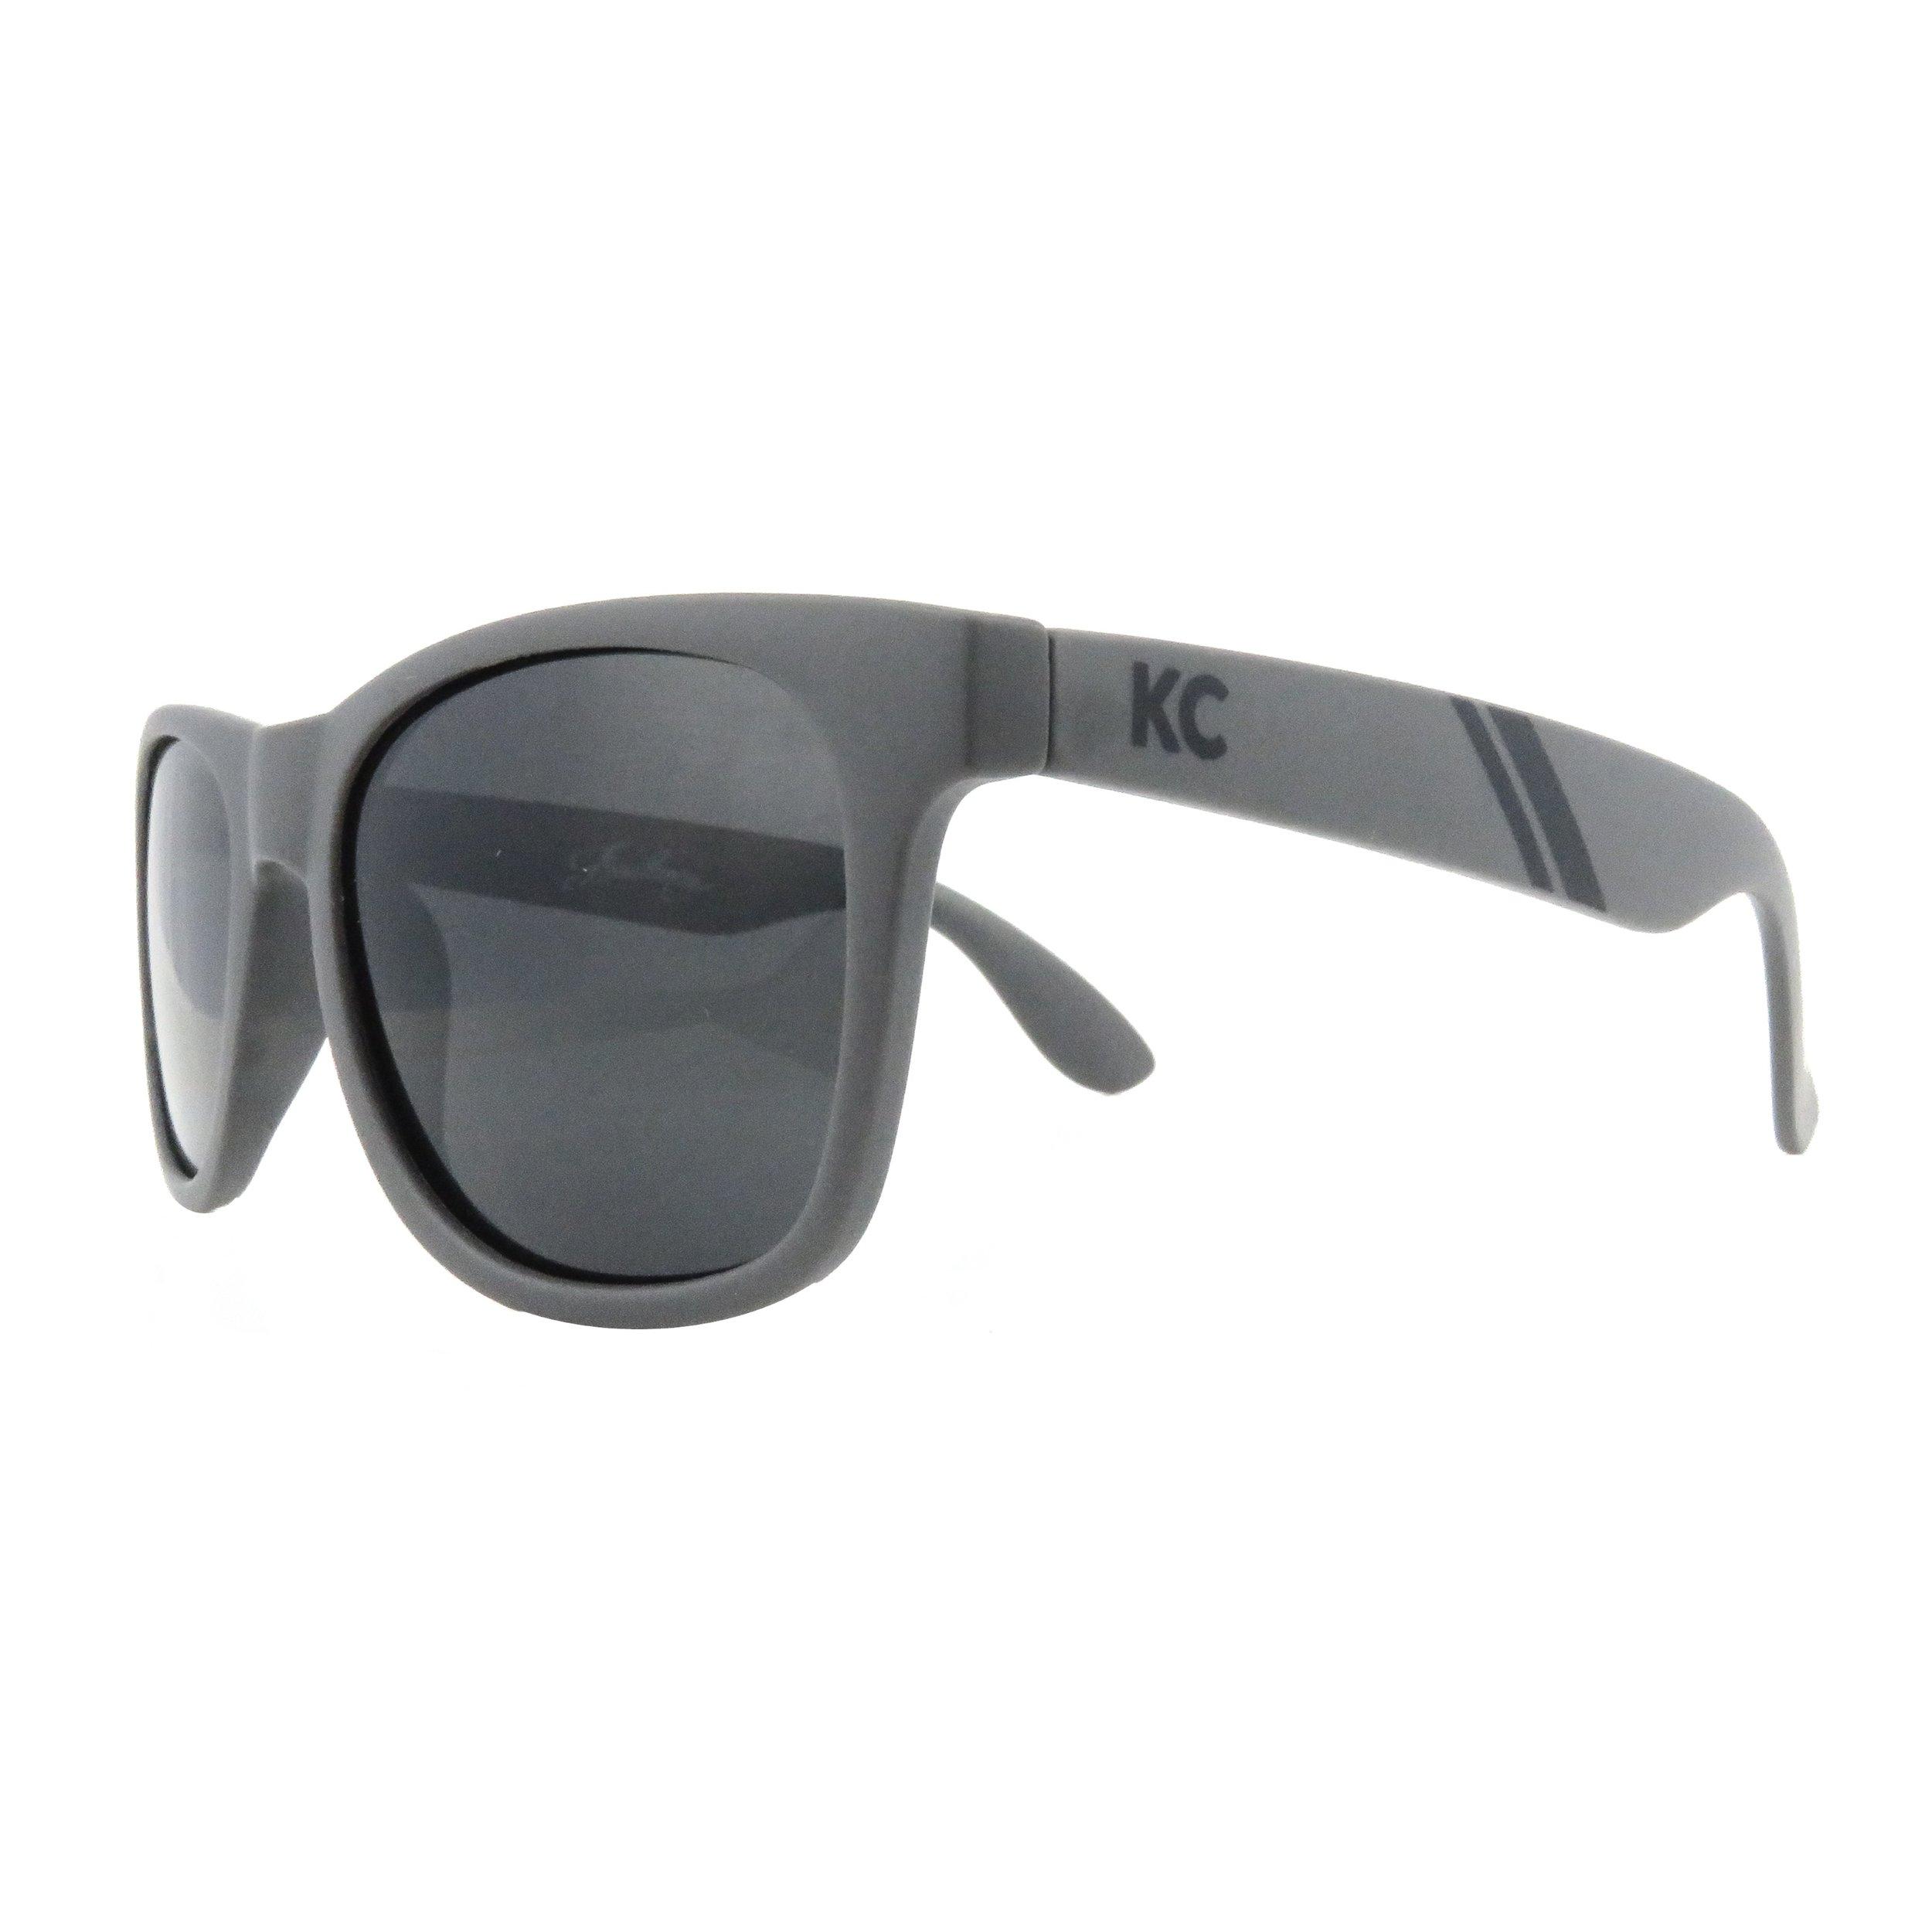 Freelance Clothing KC Stripe Sunglasses